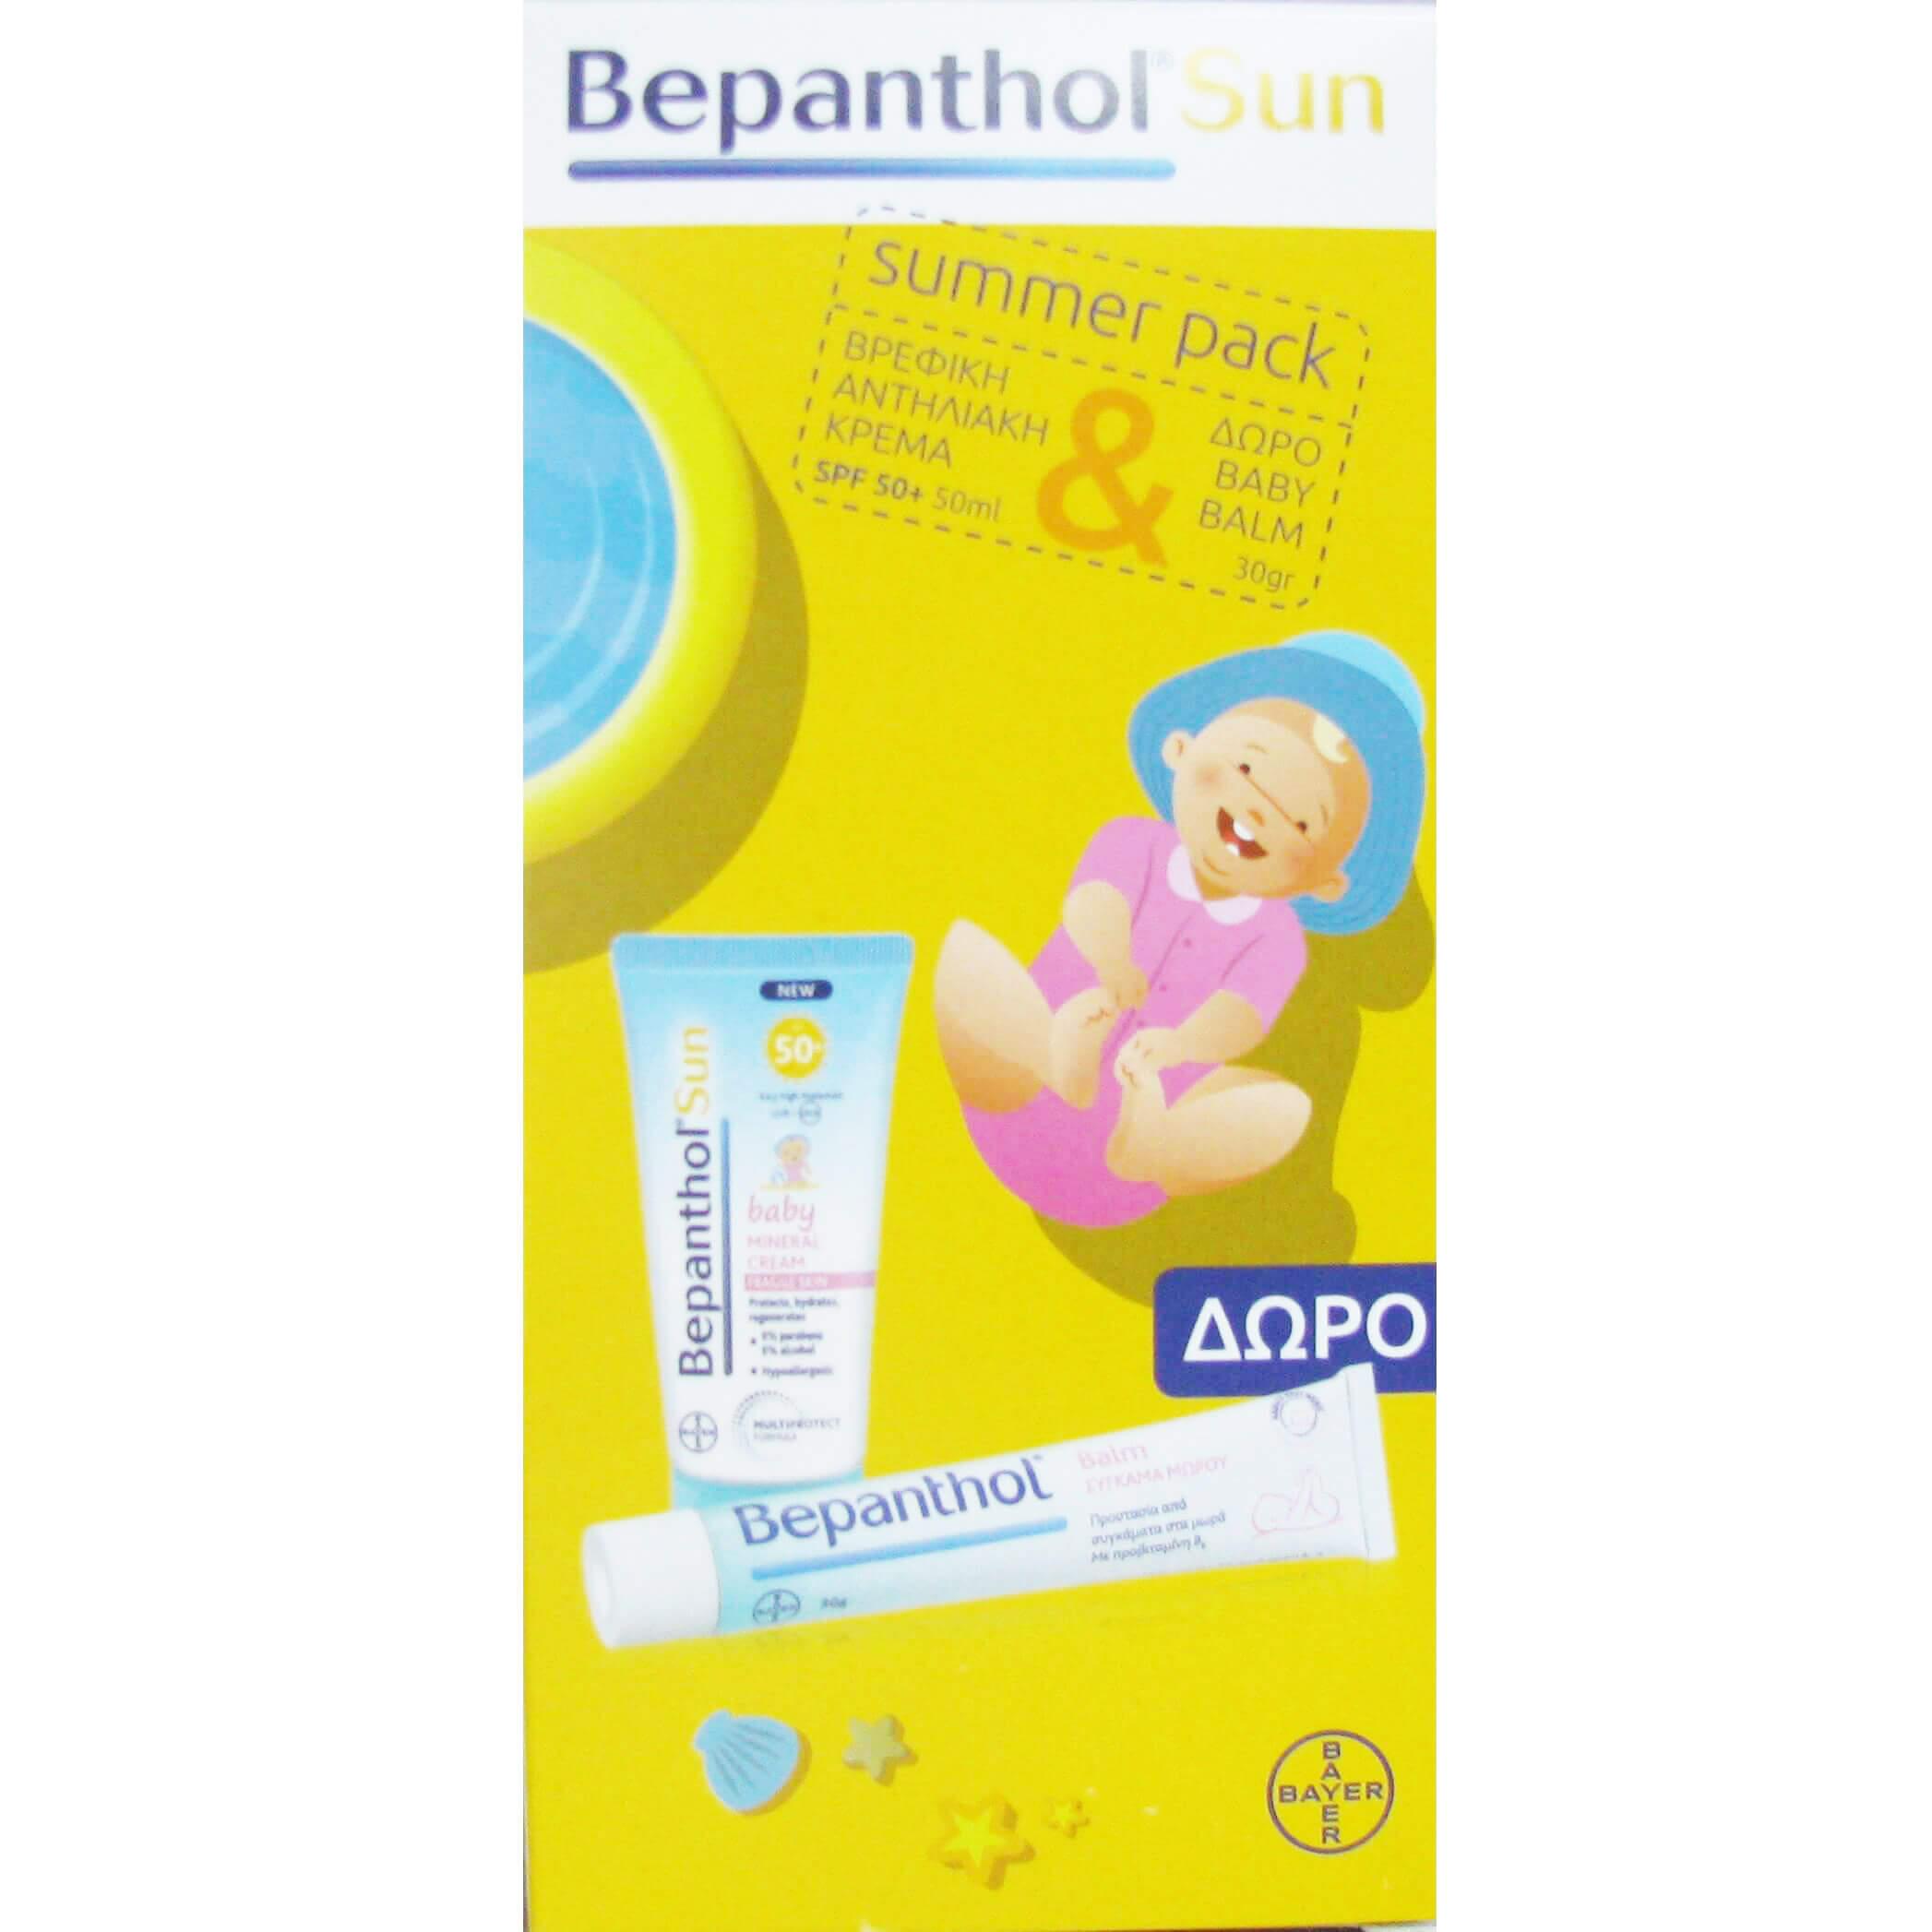 Bepanthol Sun Baby Mineral Cream Βρεφικό Αντηλιακό Spf50+ 50ml & ΔΩΡΟ Baby Balm  μητέρα παιδί   περιποίηση για το μωρό   βρεφική αντηλιακή προστασία